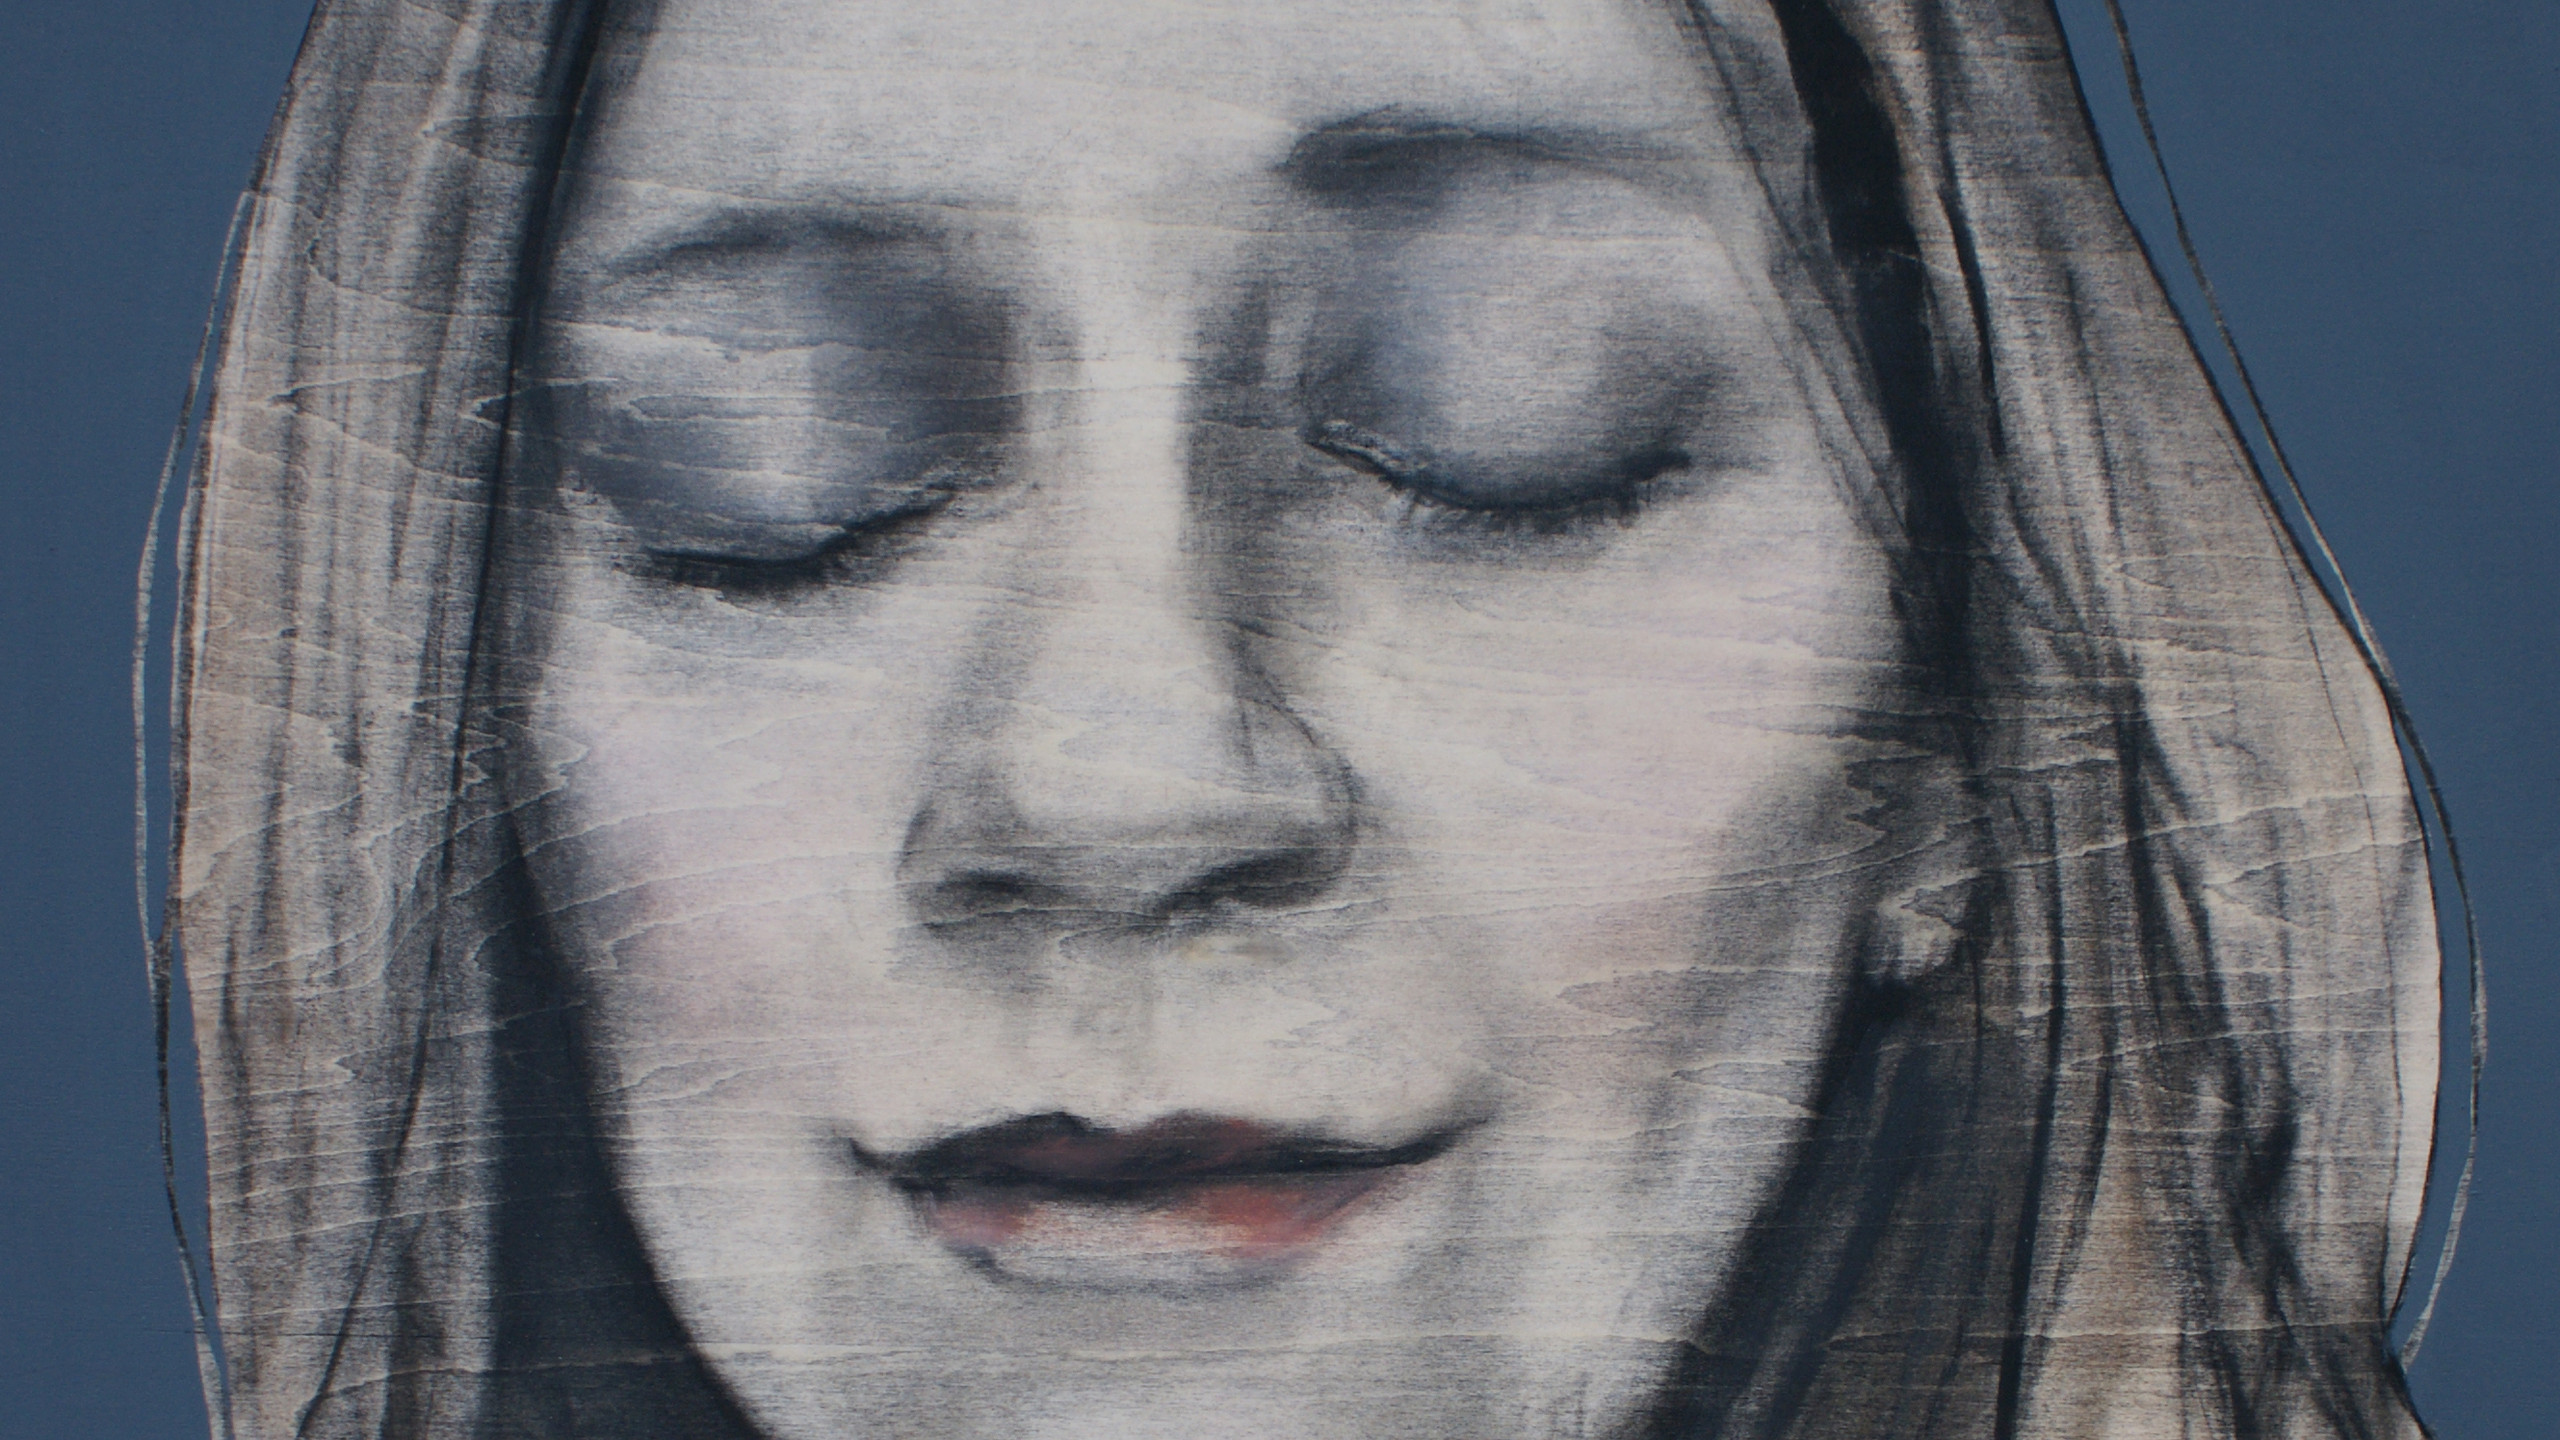 Laura Childs Meditation Portrait